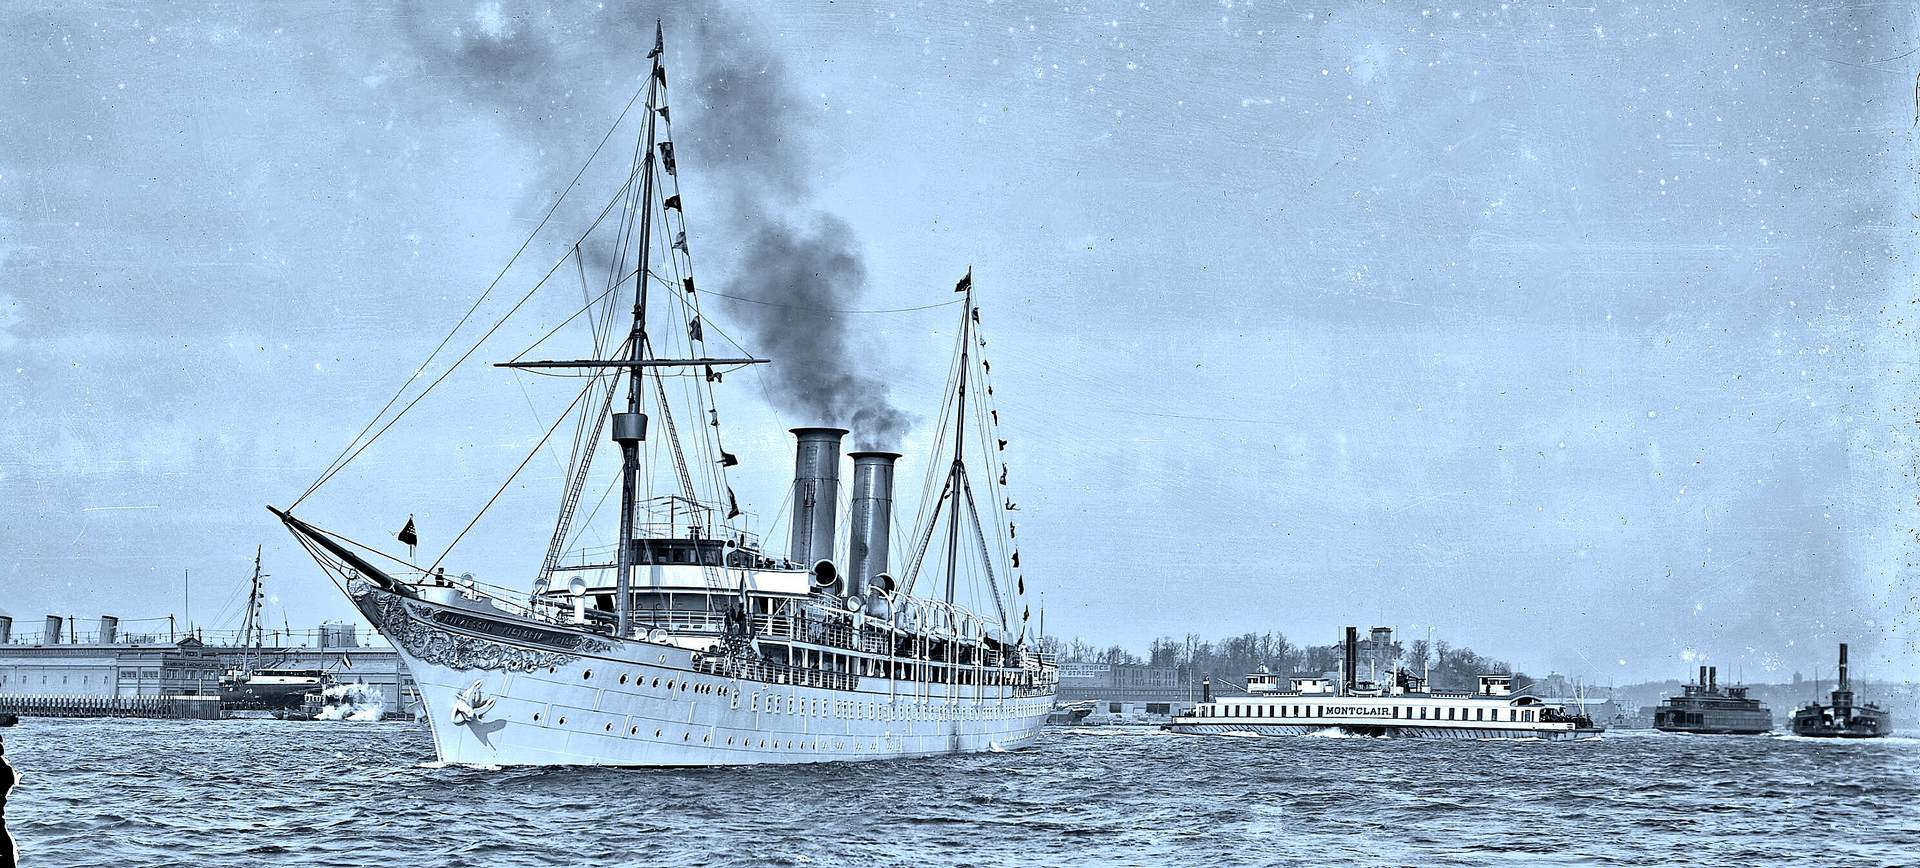 Prinzessin Victoria Luise: первое круизное судно